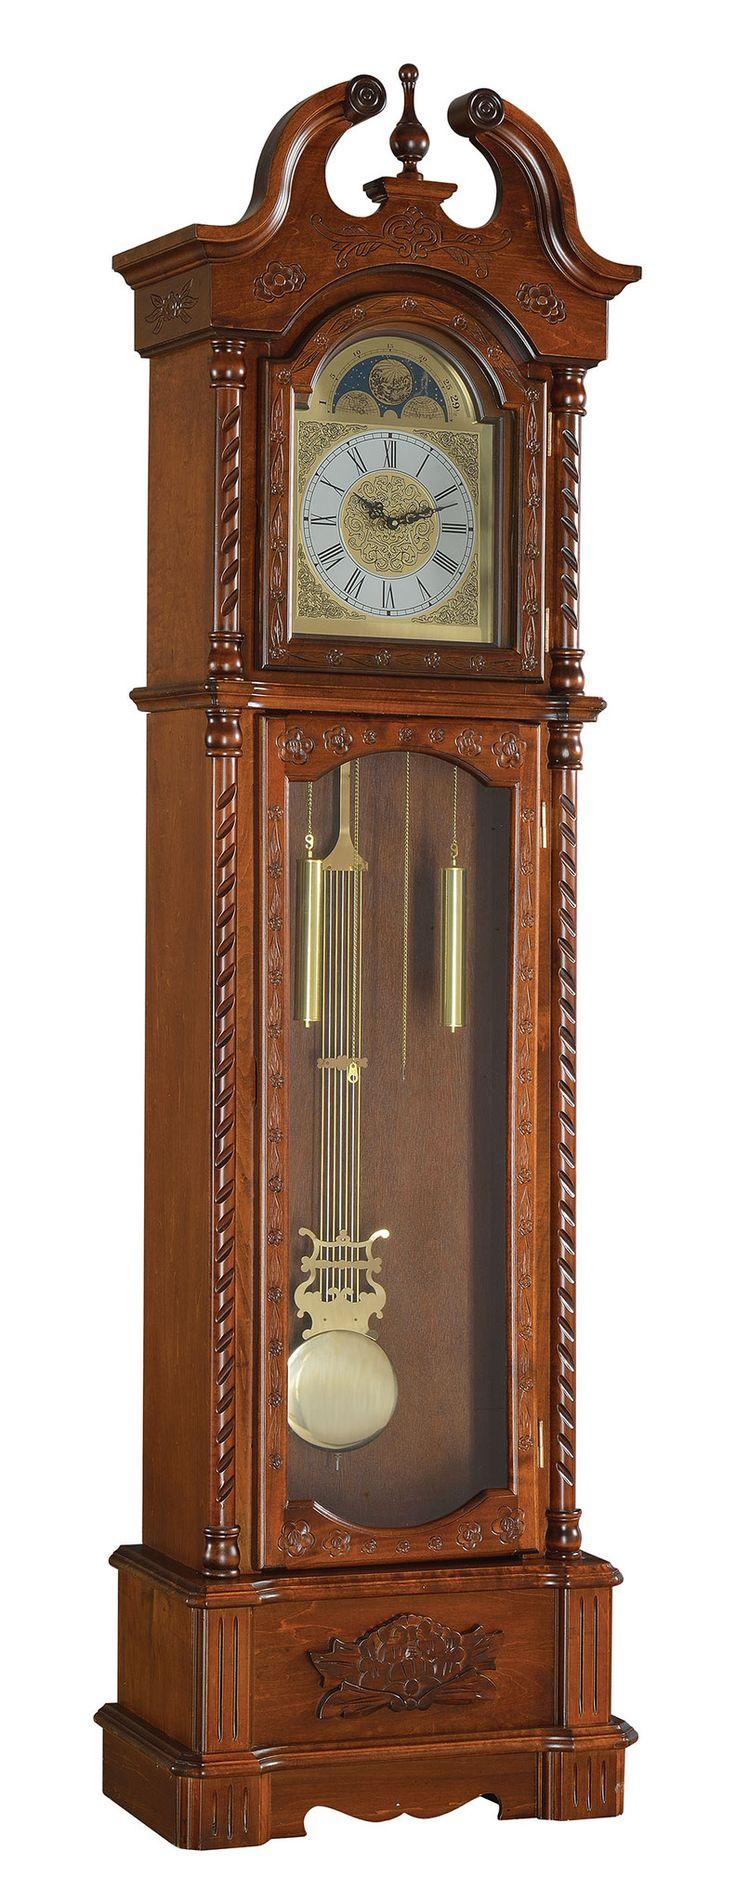 Dark Oak Grandfather Clock - 97085